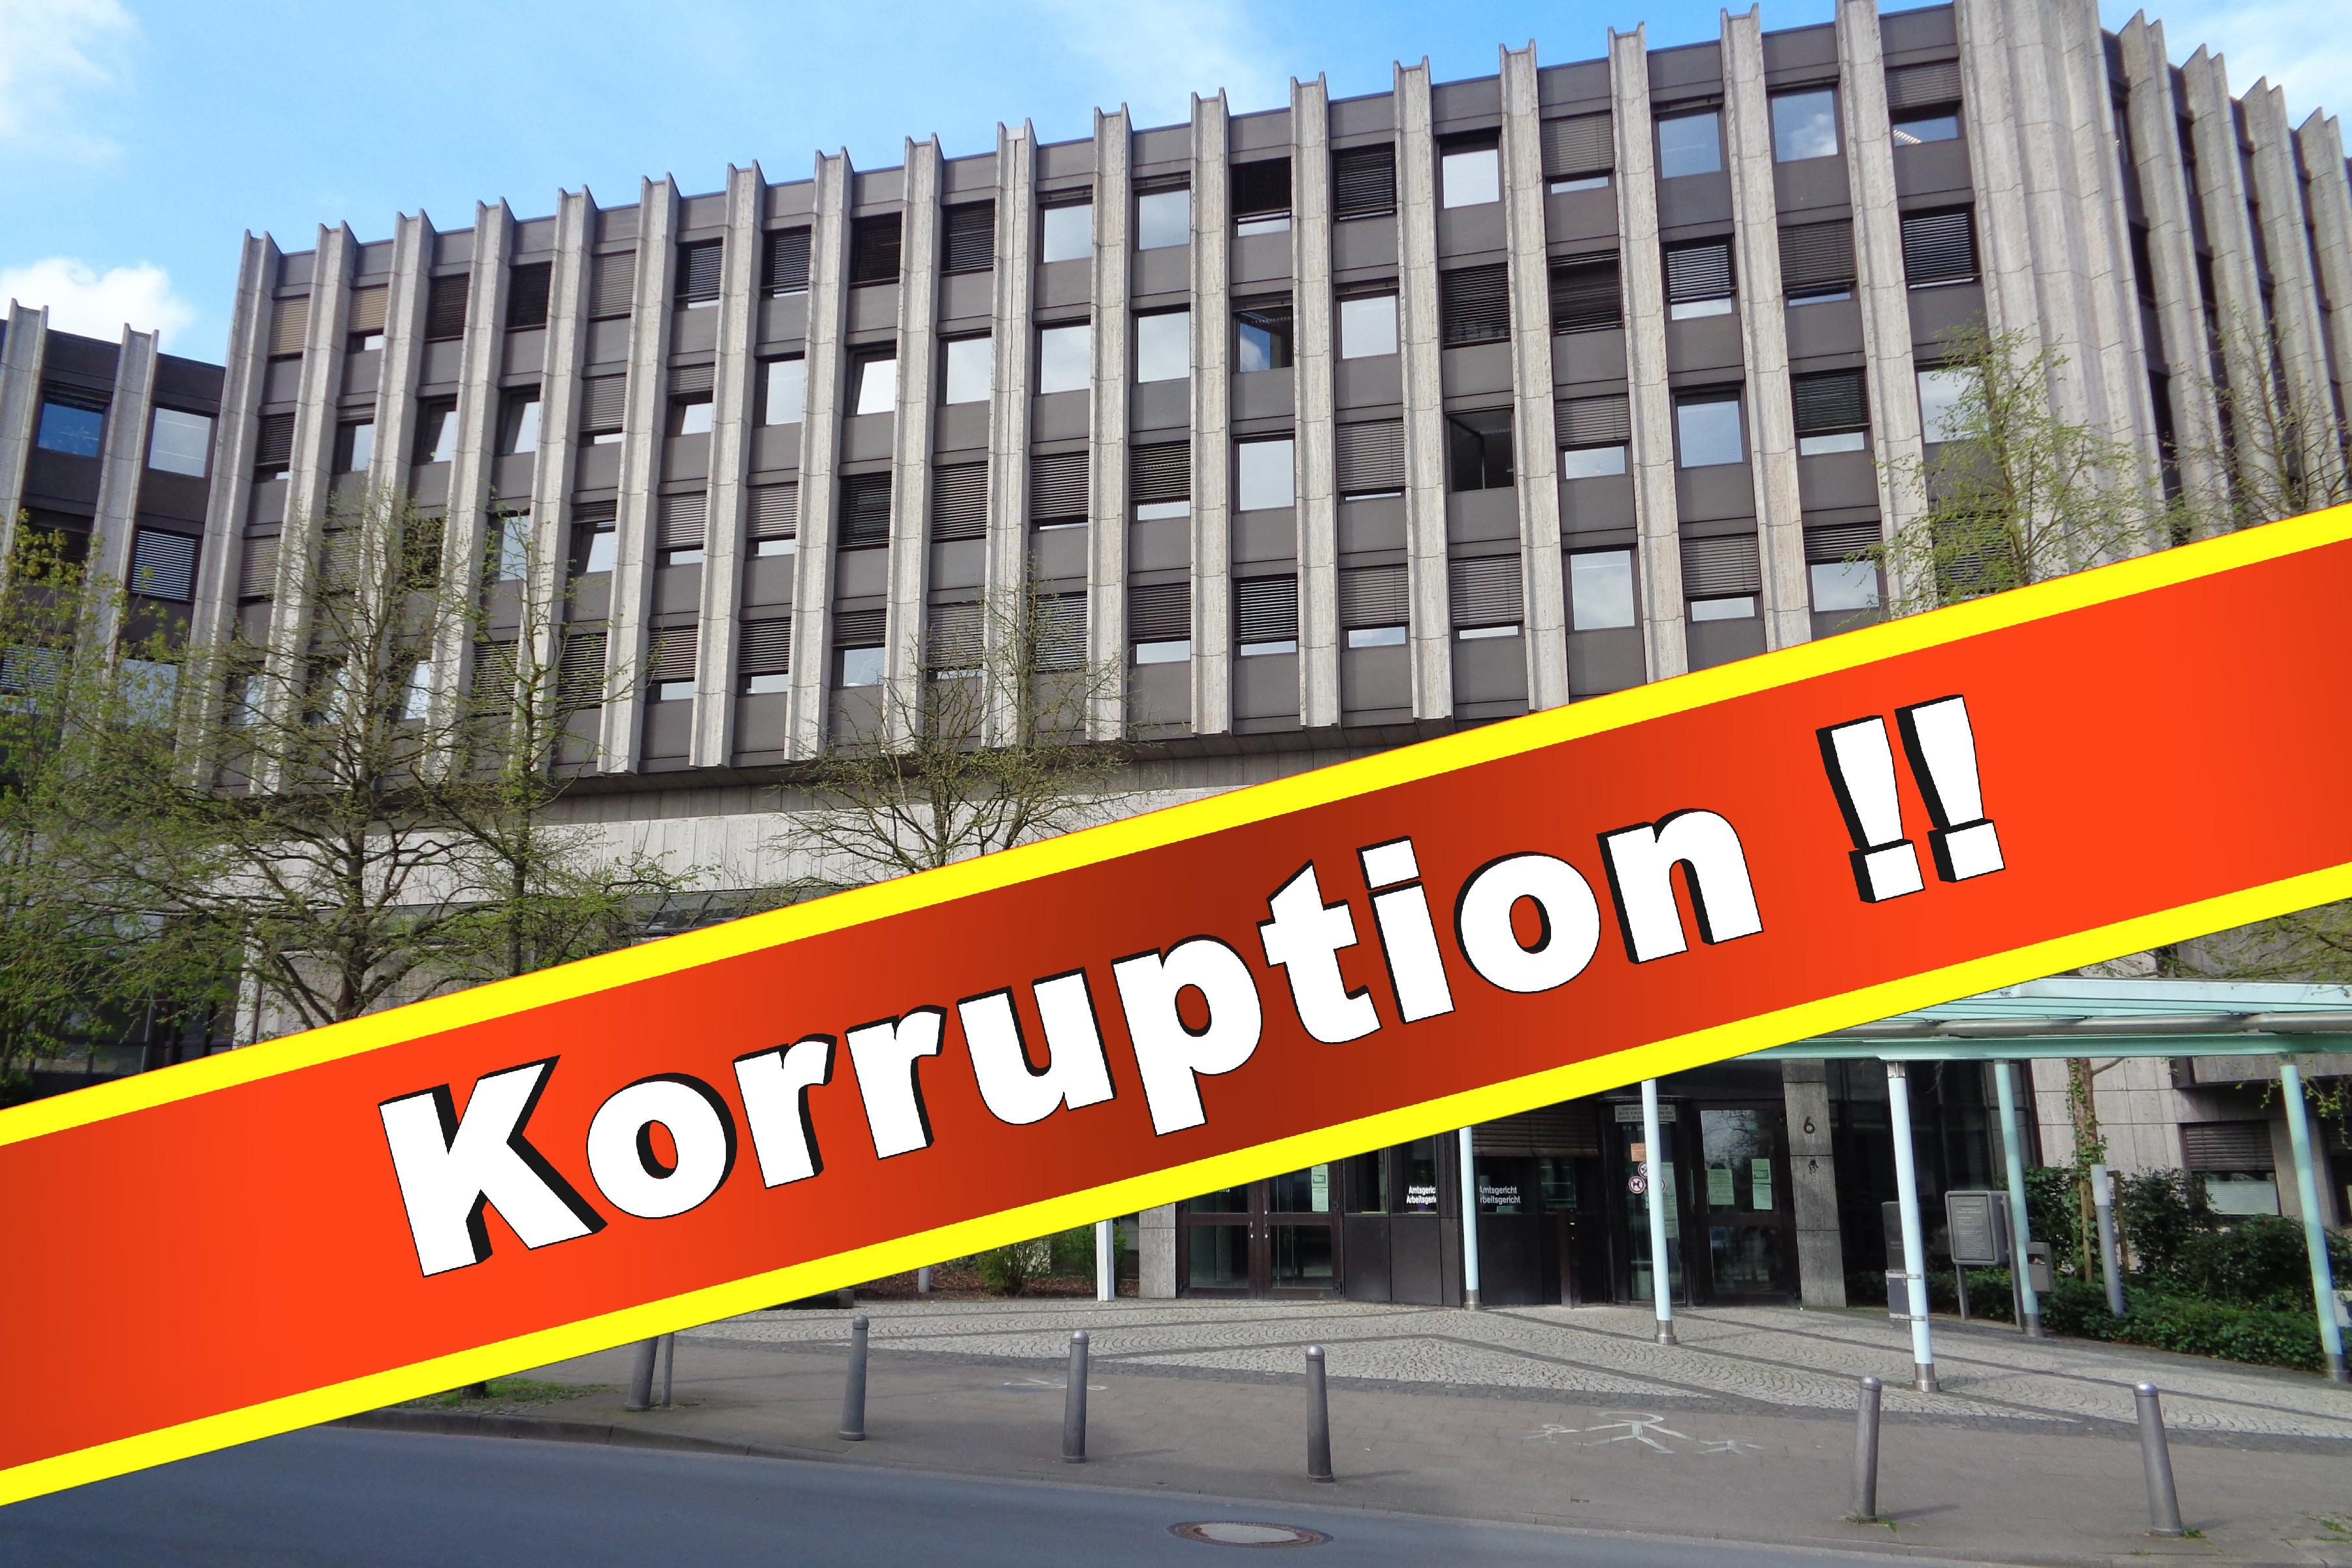 Jva Bielefeld Zinnstraße 33 Jva Bielefeld Brackwede Grill Jva Bielefeld Besuchszeiten Jva Bielefeld Stellenangebote Jva Bielefeld Senne Außenstellen Jva Bielefeld (34)